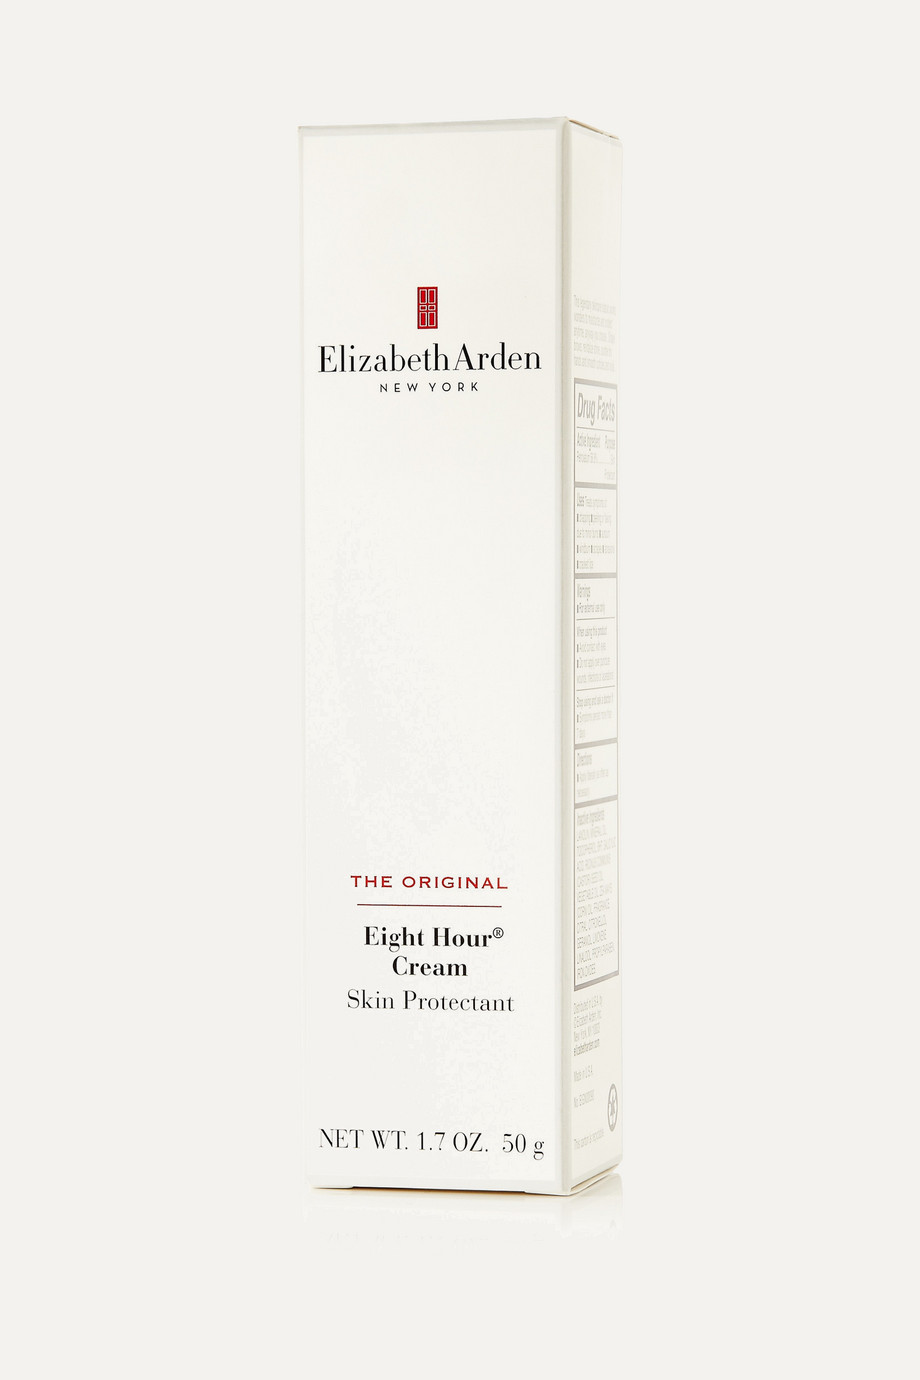 Elizabeth Arden Eight Hour® Cream Skin Protectant The Original, 50 ml – Creme